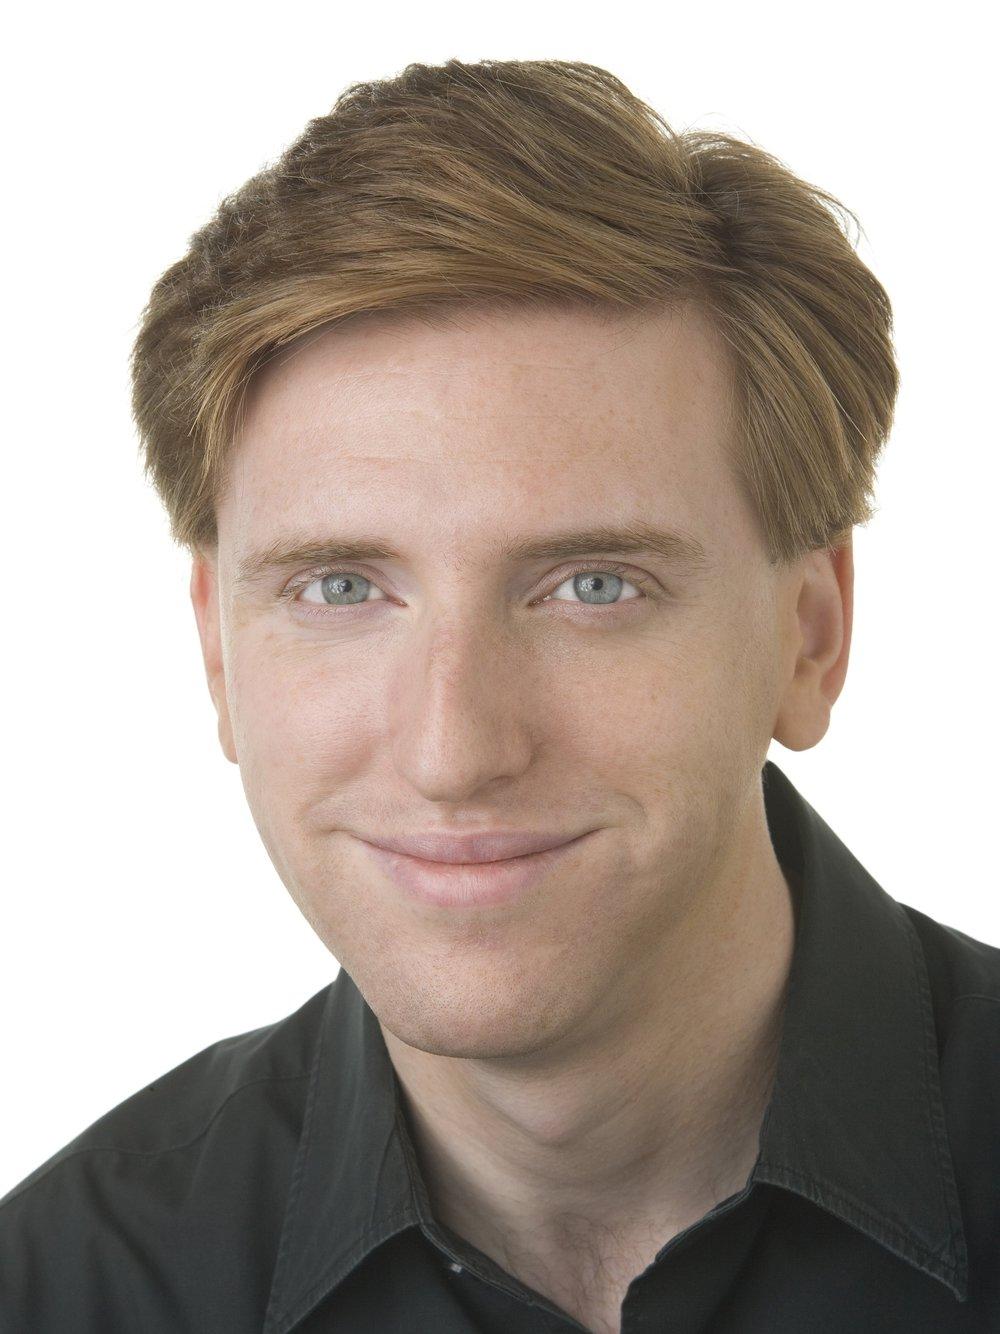 Copy of David Hanlon, Pianist